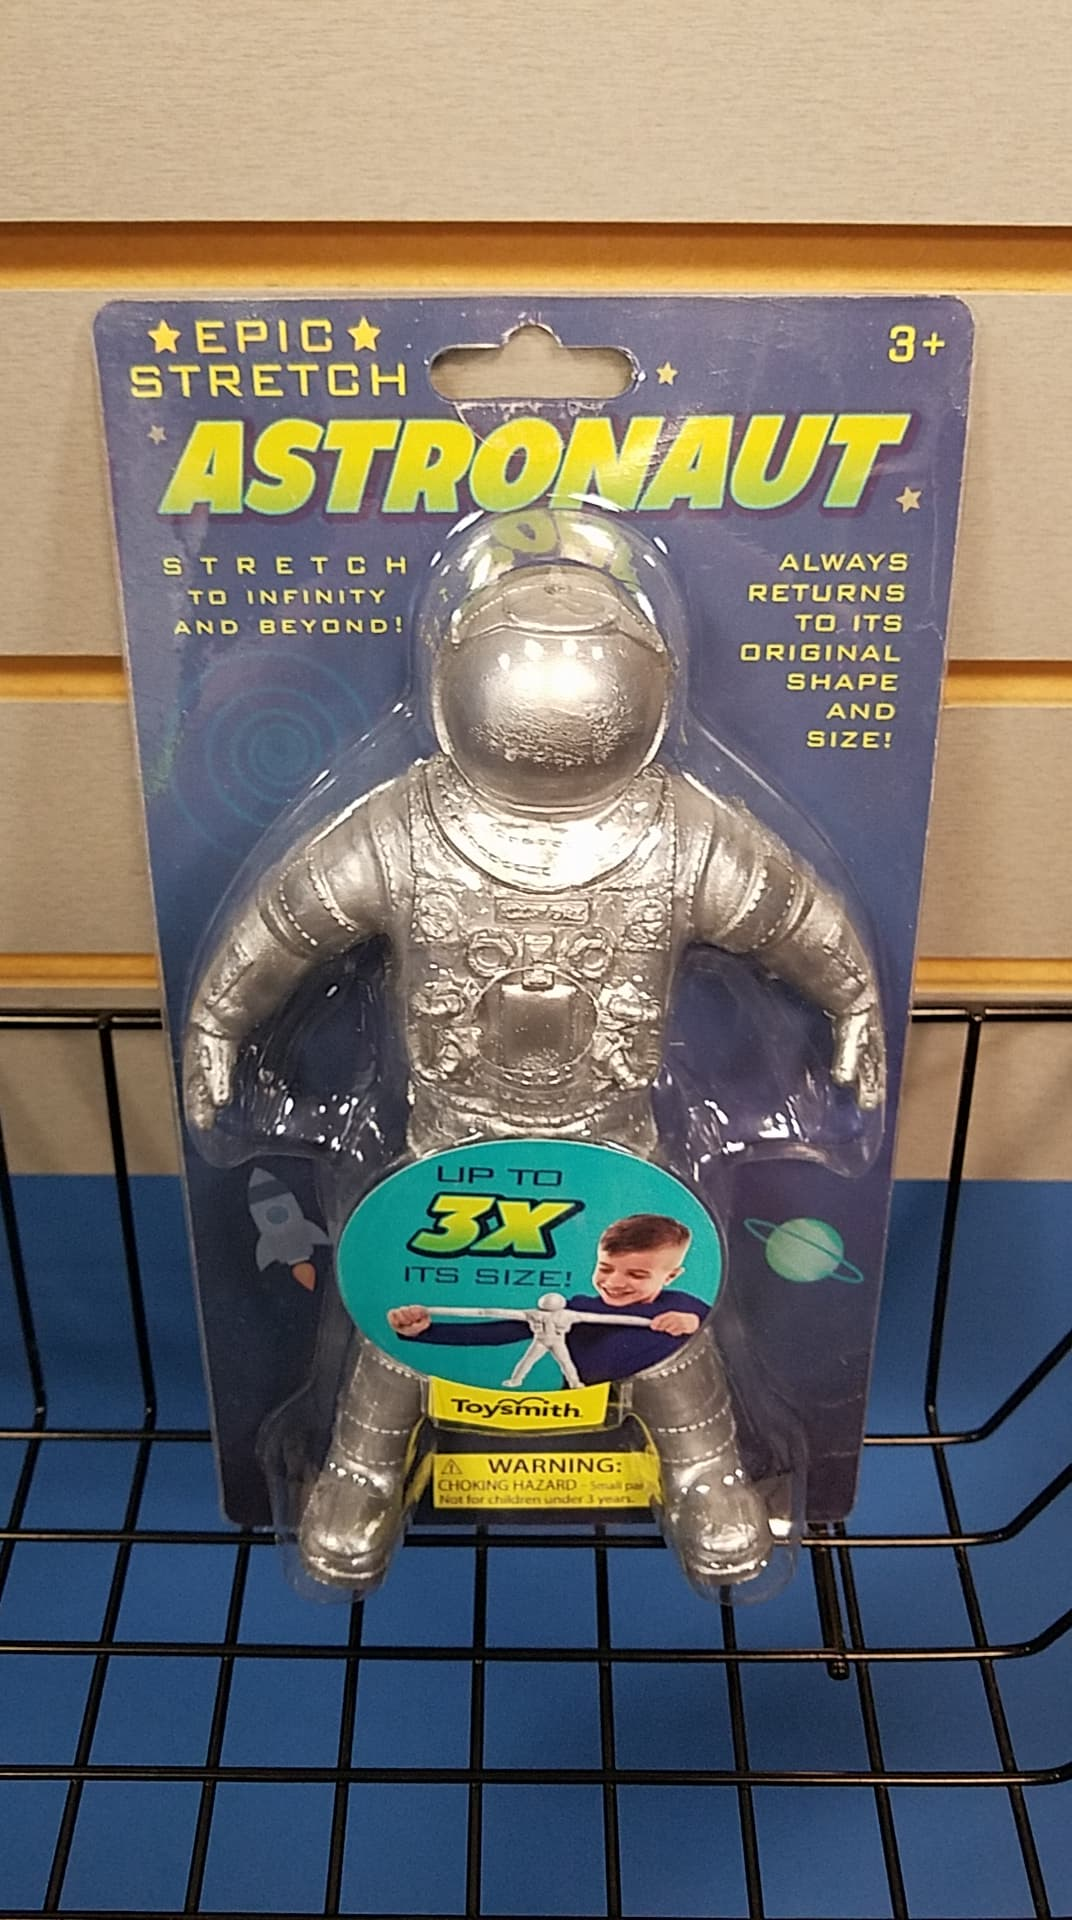 Epic Stretch Astronaut